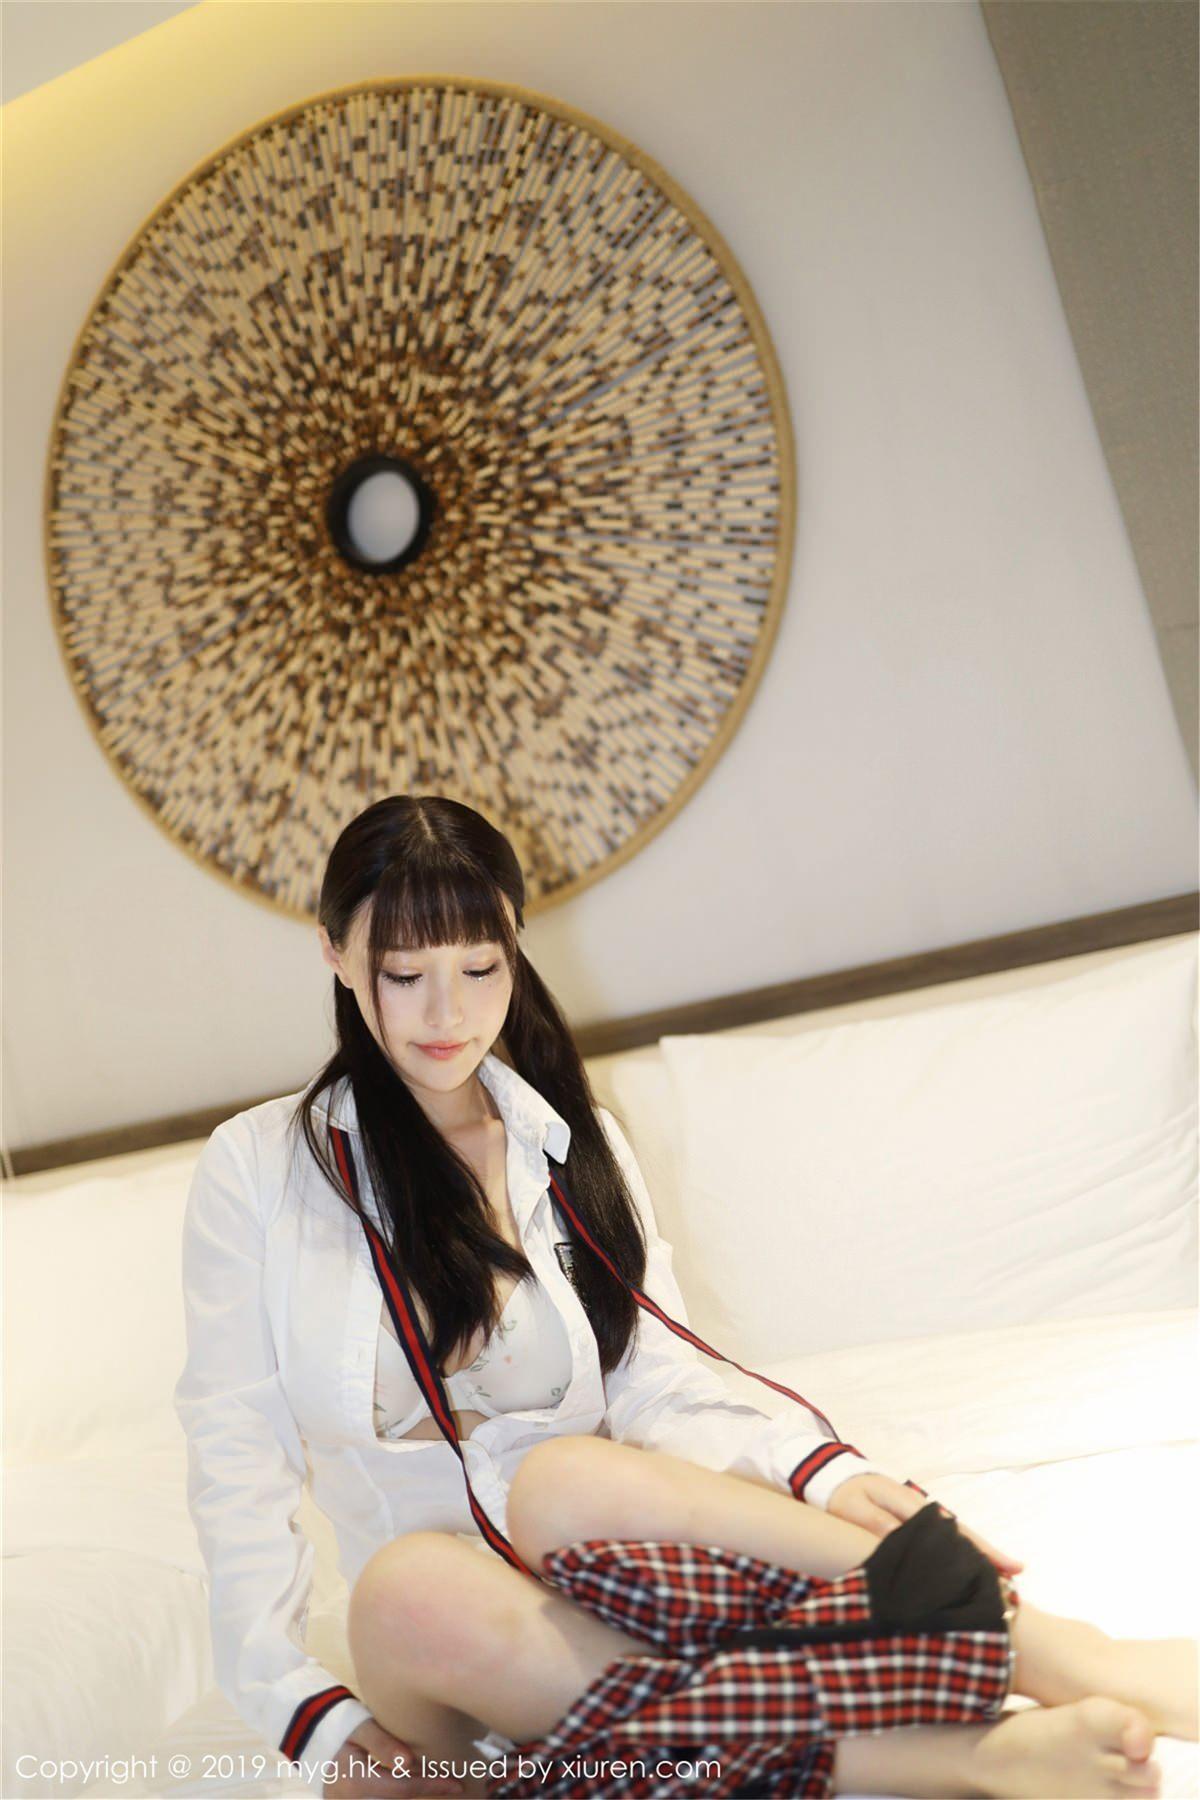 MyGirl Vol.363 6P, mygirl, Zhu Ke Er